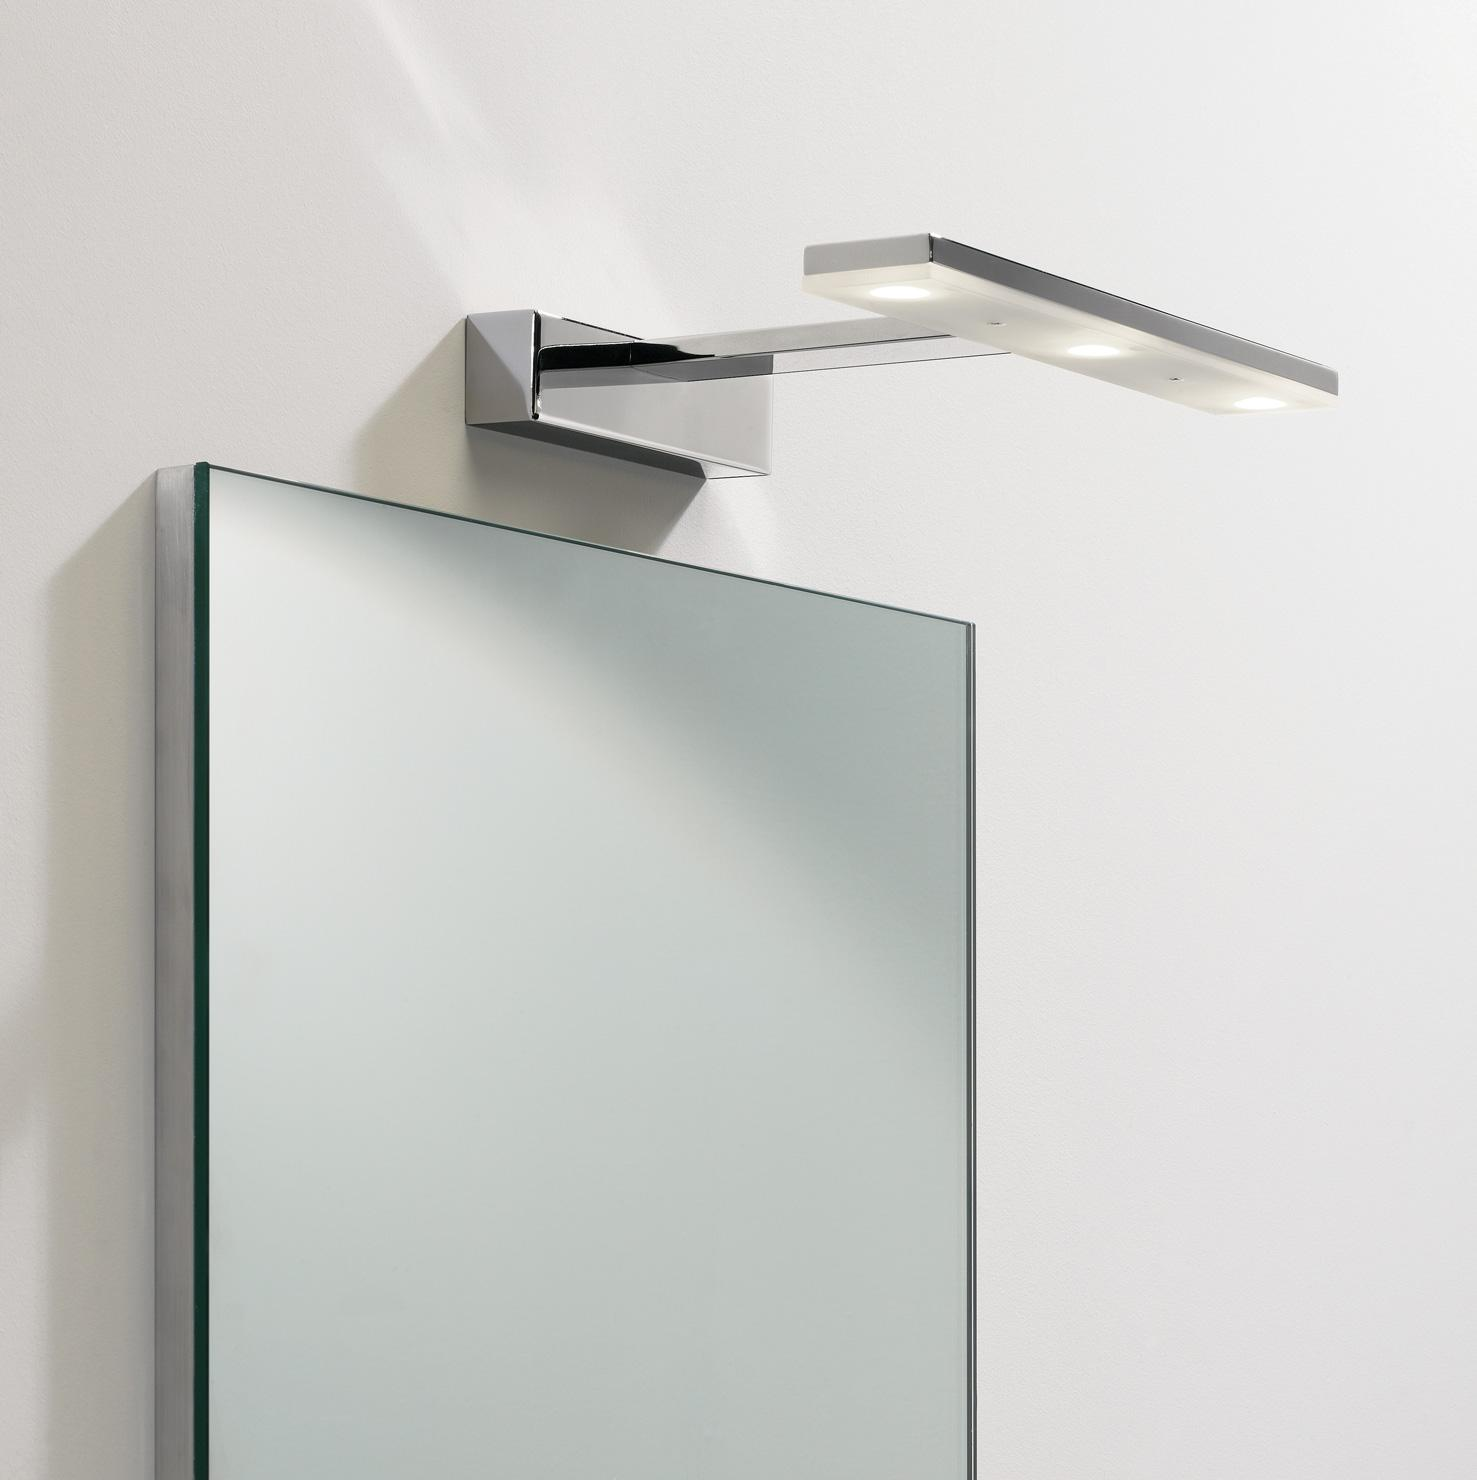 ZIPPY applique specchio